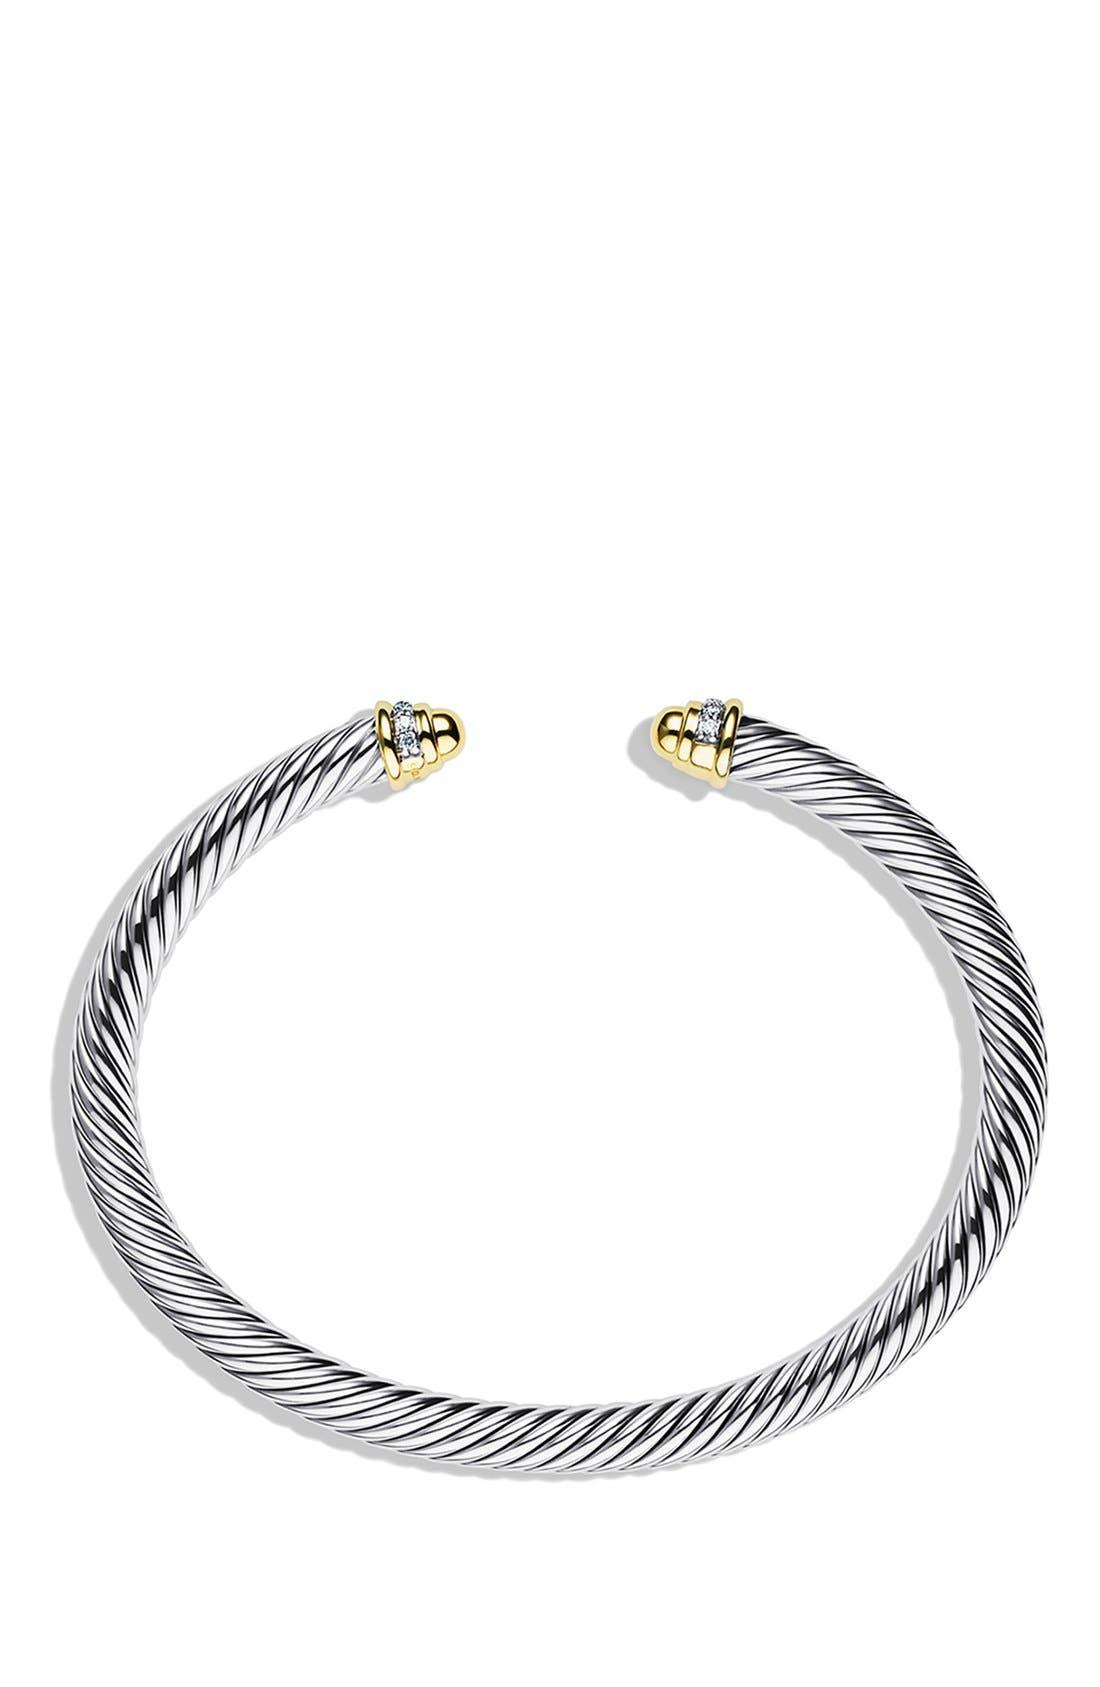 Cable Classics Bracelet with 18K Gold Domes & Diamonds, 5mm,                             Alternate thumbnail 3, color,                             711